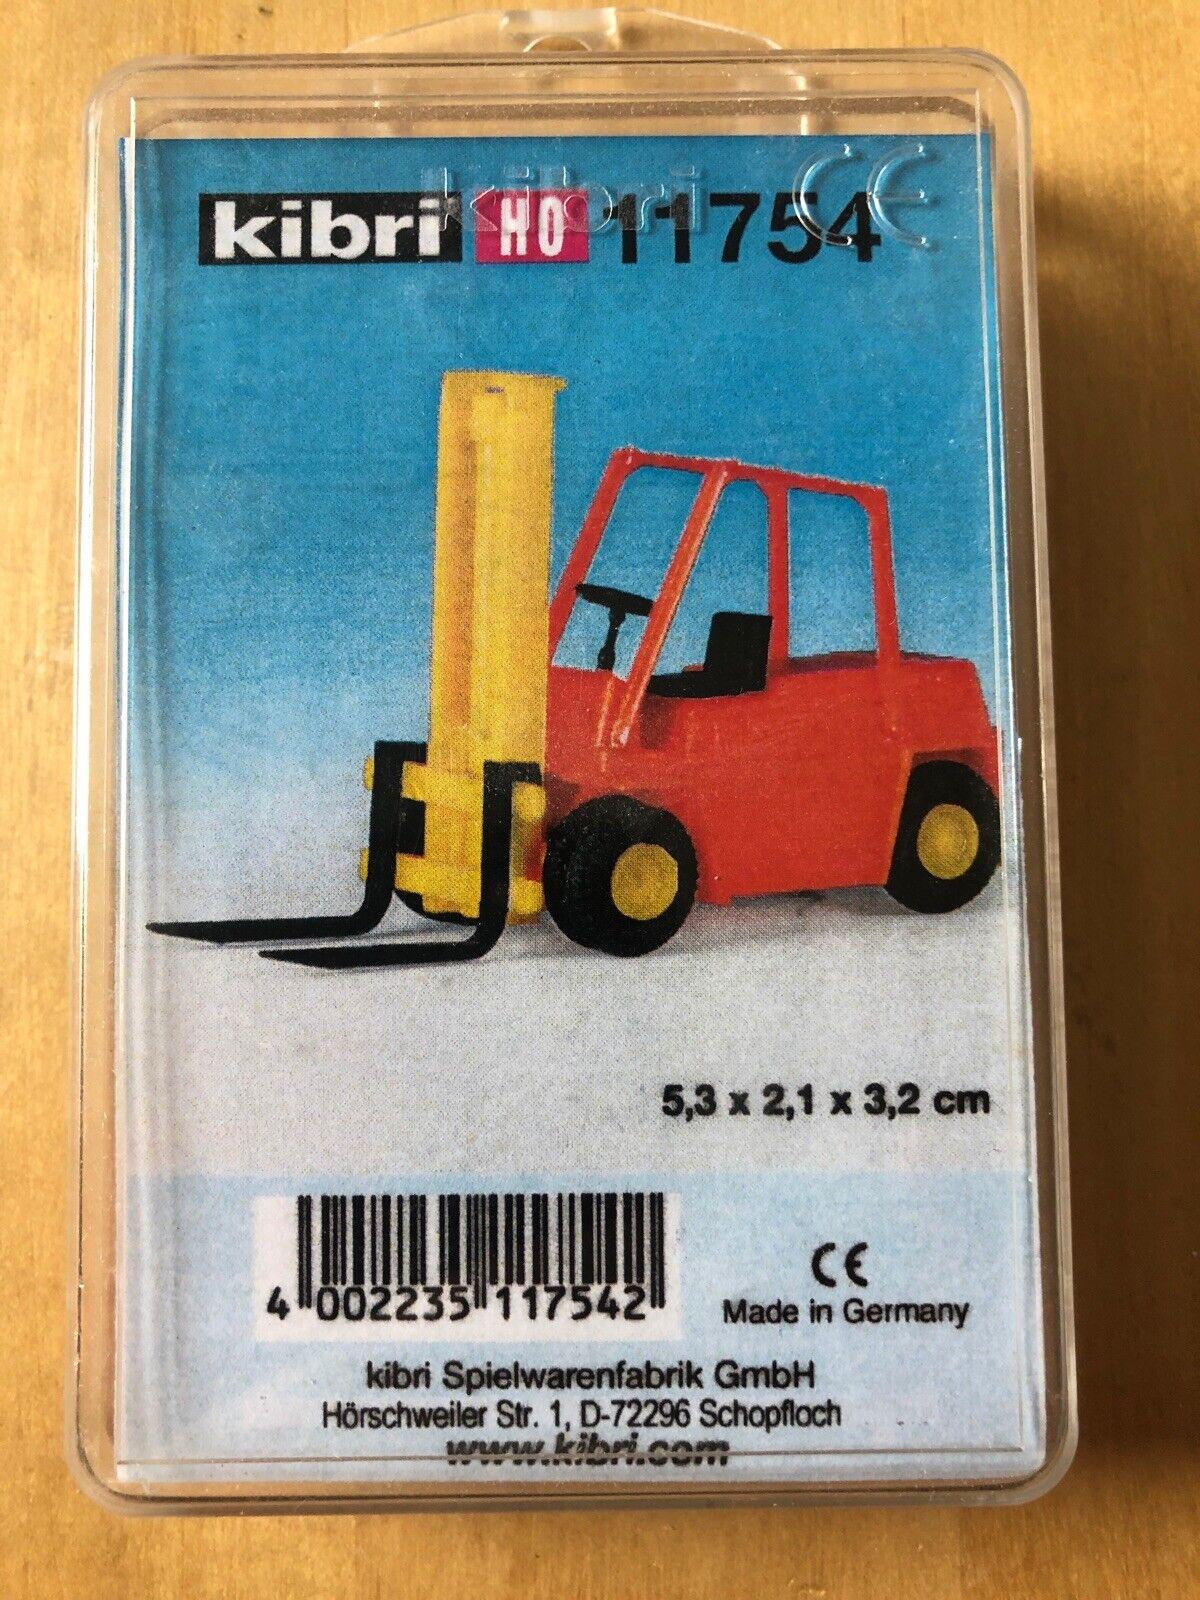 kibri 11754 Spur H0 STEINBOCK Gabelstapler #Neu in OVP#